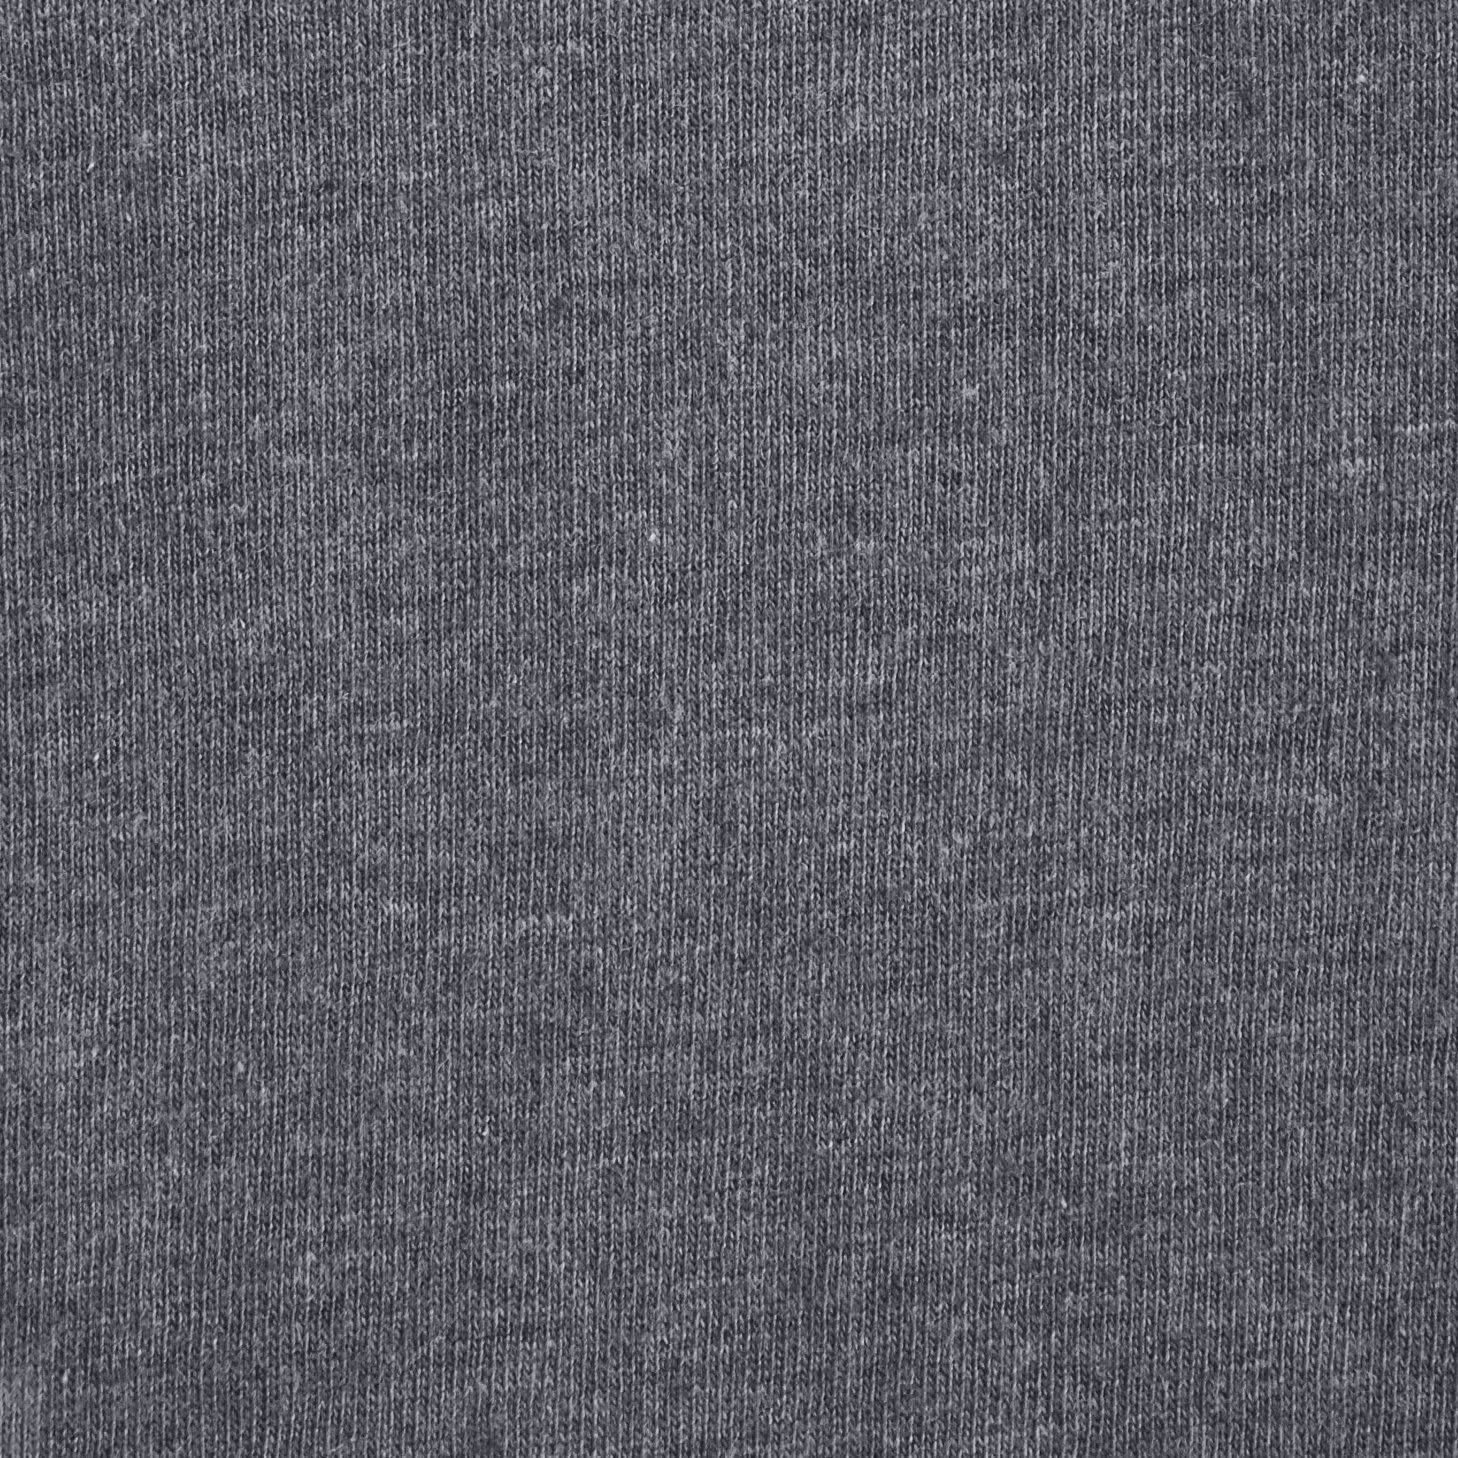 Basics Heather Cotton Jersey Bed Sheet Set Light Grey Full